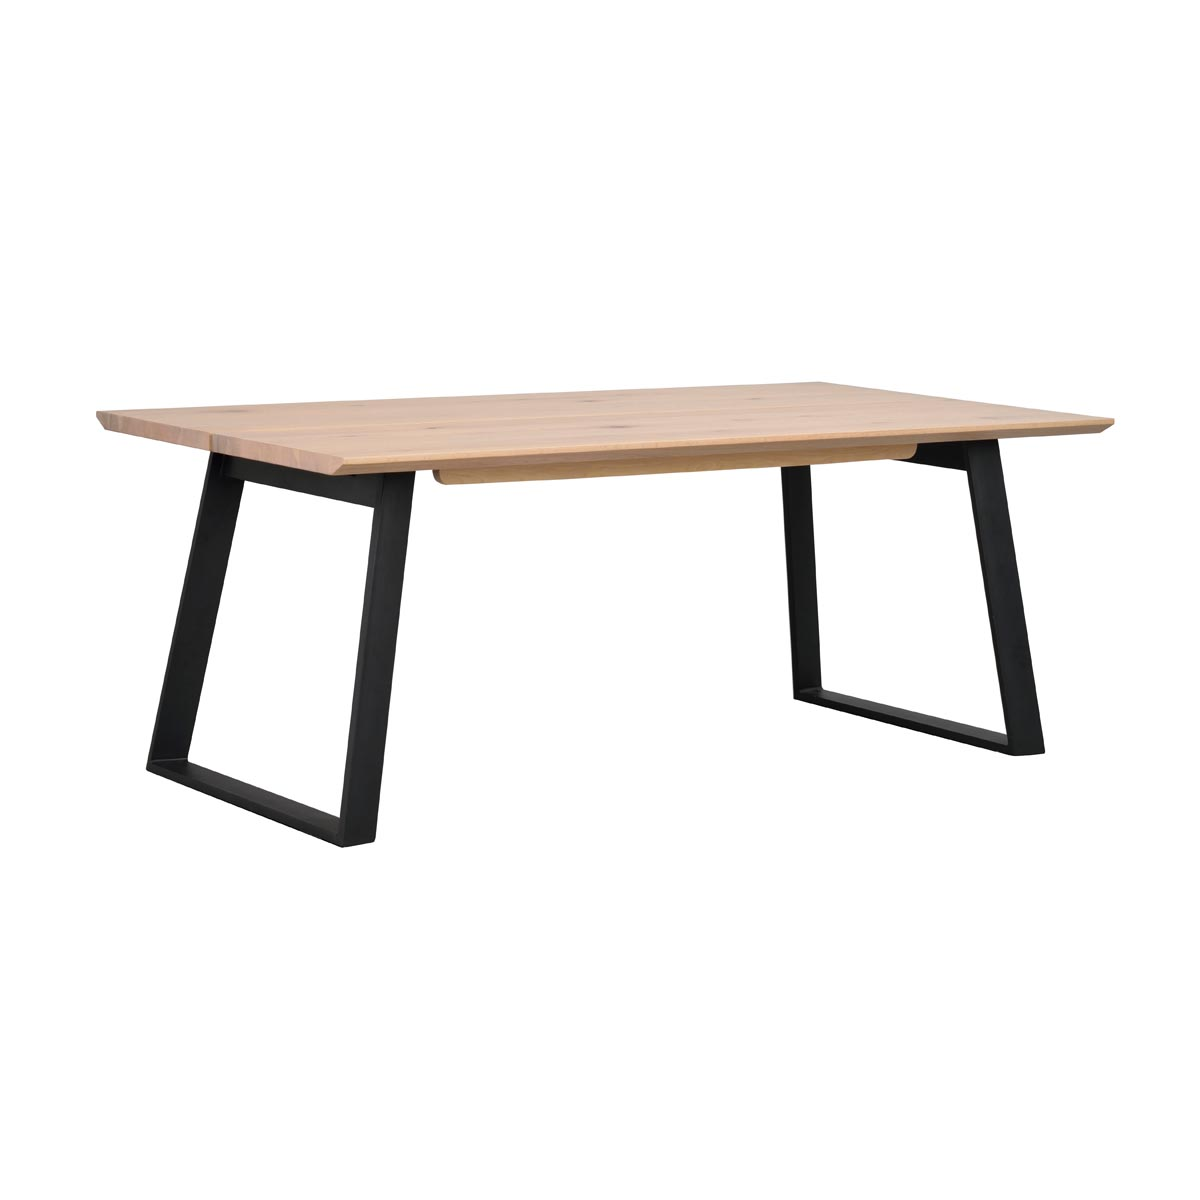 Melville-matbord-vitpigm-vildek-119370_b